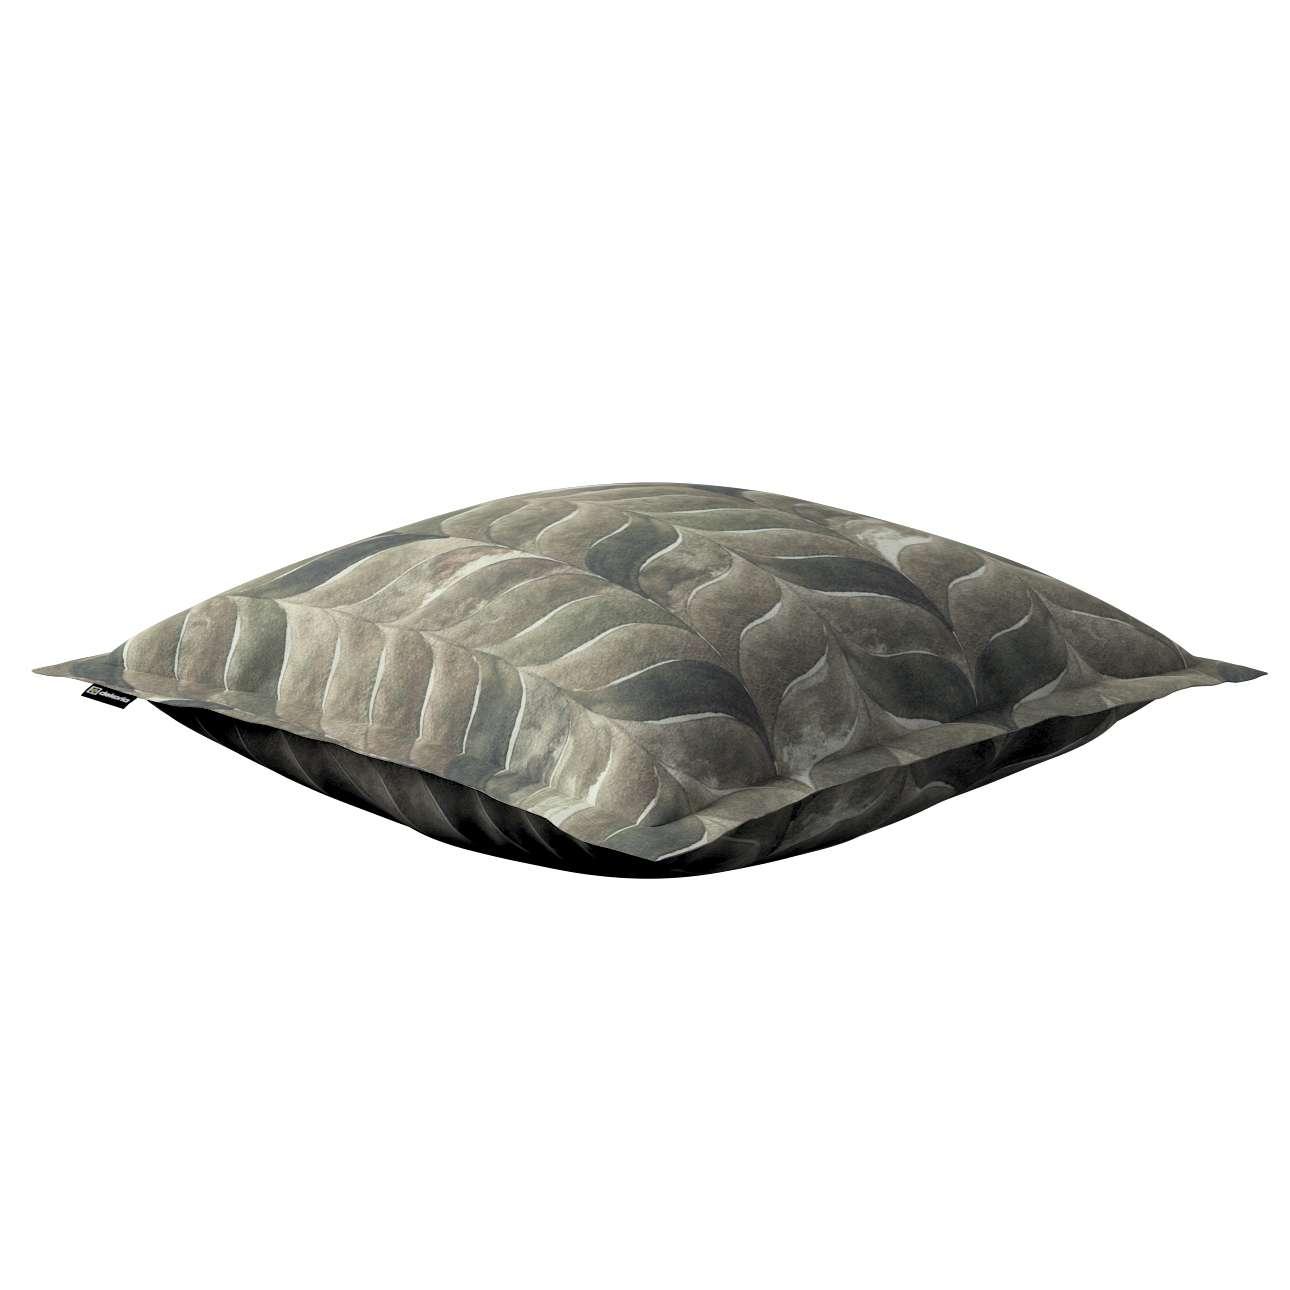 Mona - potah na polštář hladký lem po obvodu v kolekci Abigail, látka: 143-12